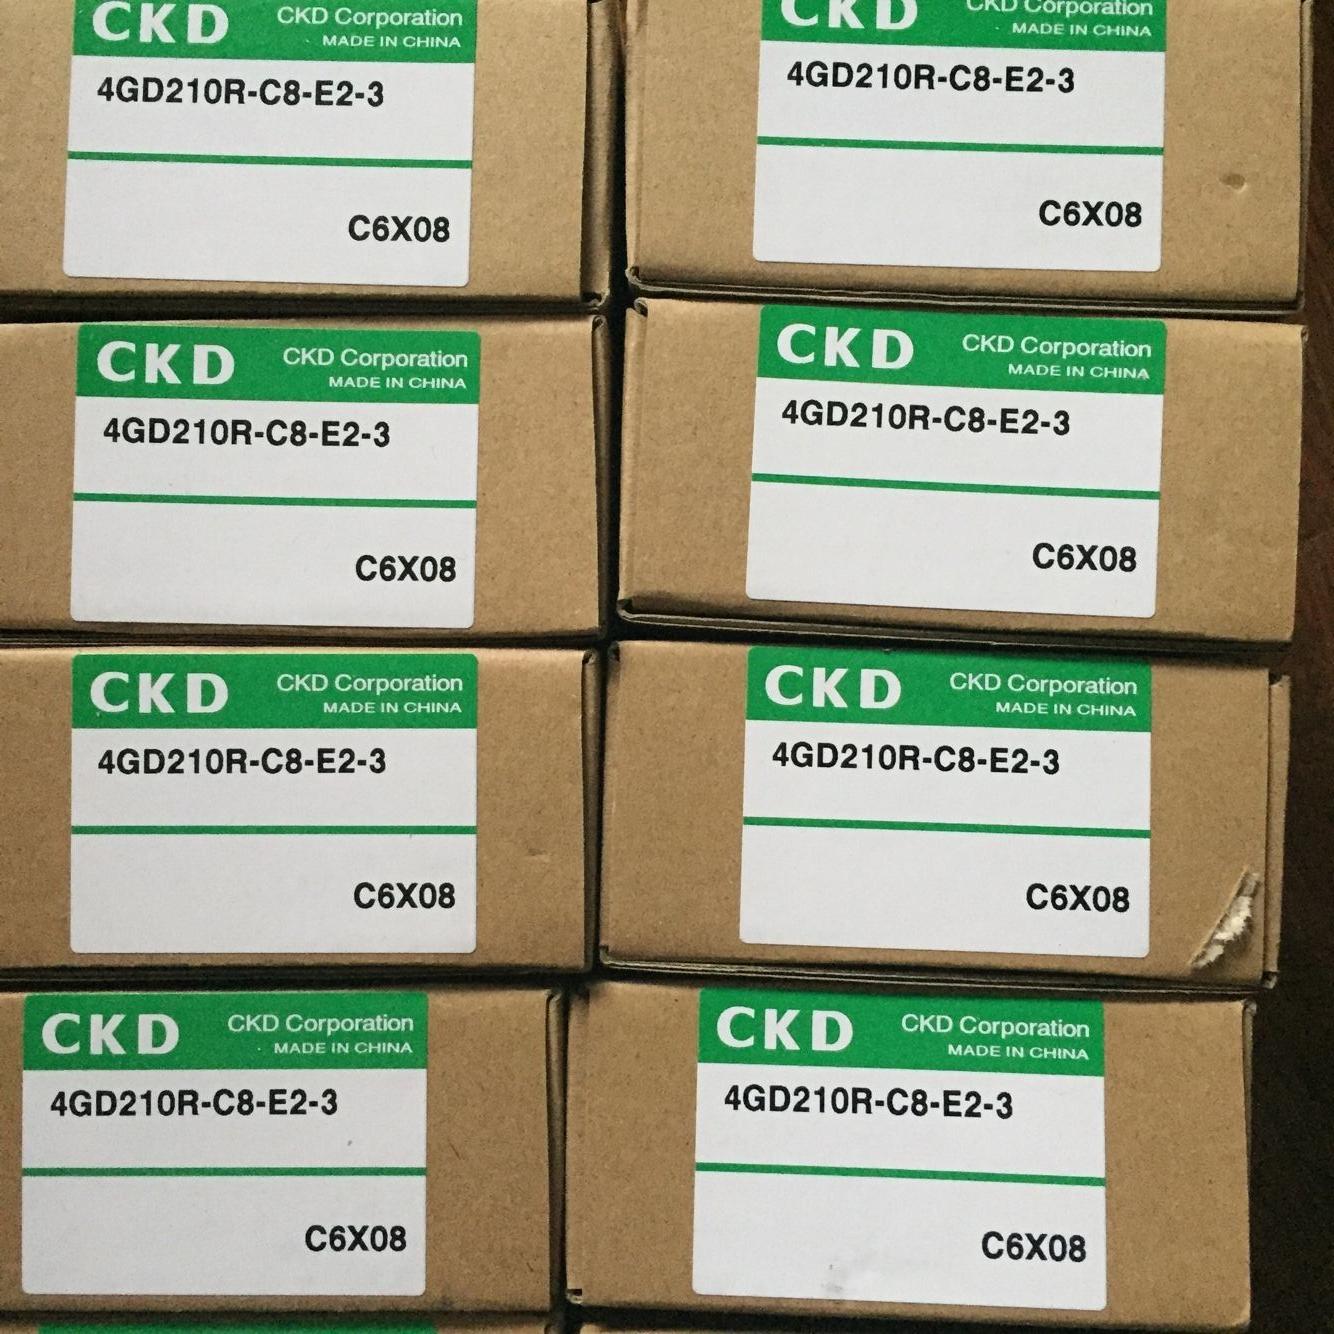 Van điện từ CKD 4GD210R-C8-E2-3